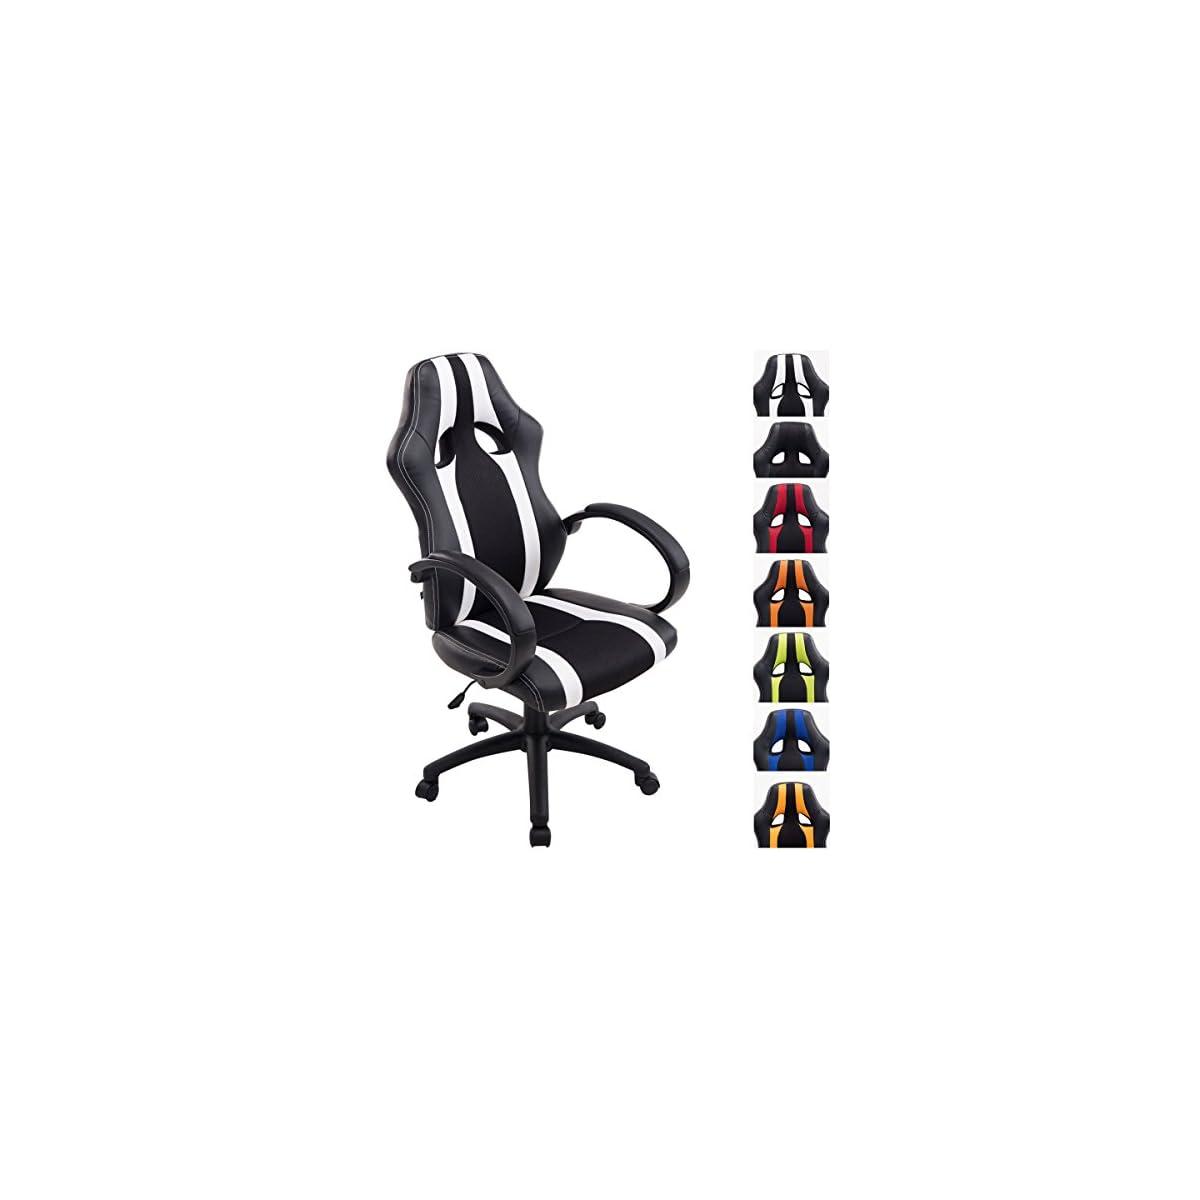 51ppNpI3ULL. SS1200  - CLP Silla Racing Vettel en Cuero Sintético & Tela en Red I Silla Gamer Ergonómica & con Respaldo I Silla de Oficina con Ruedas I Color: